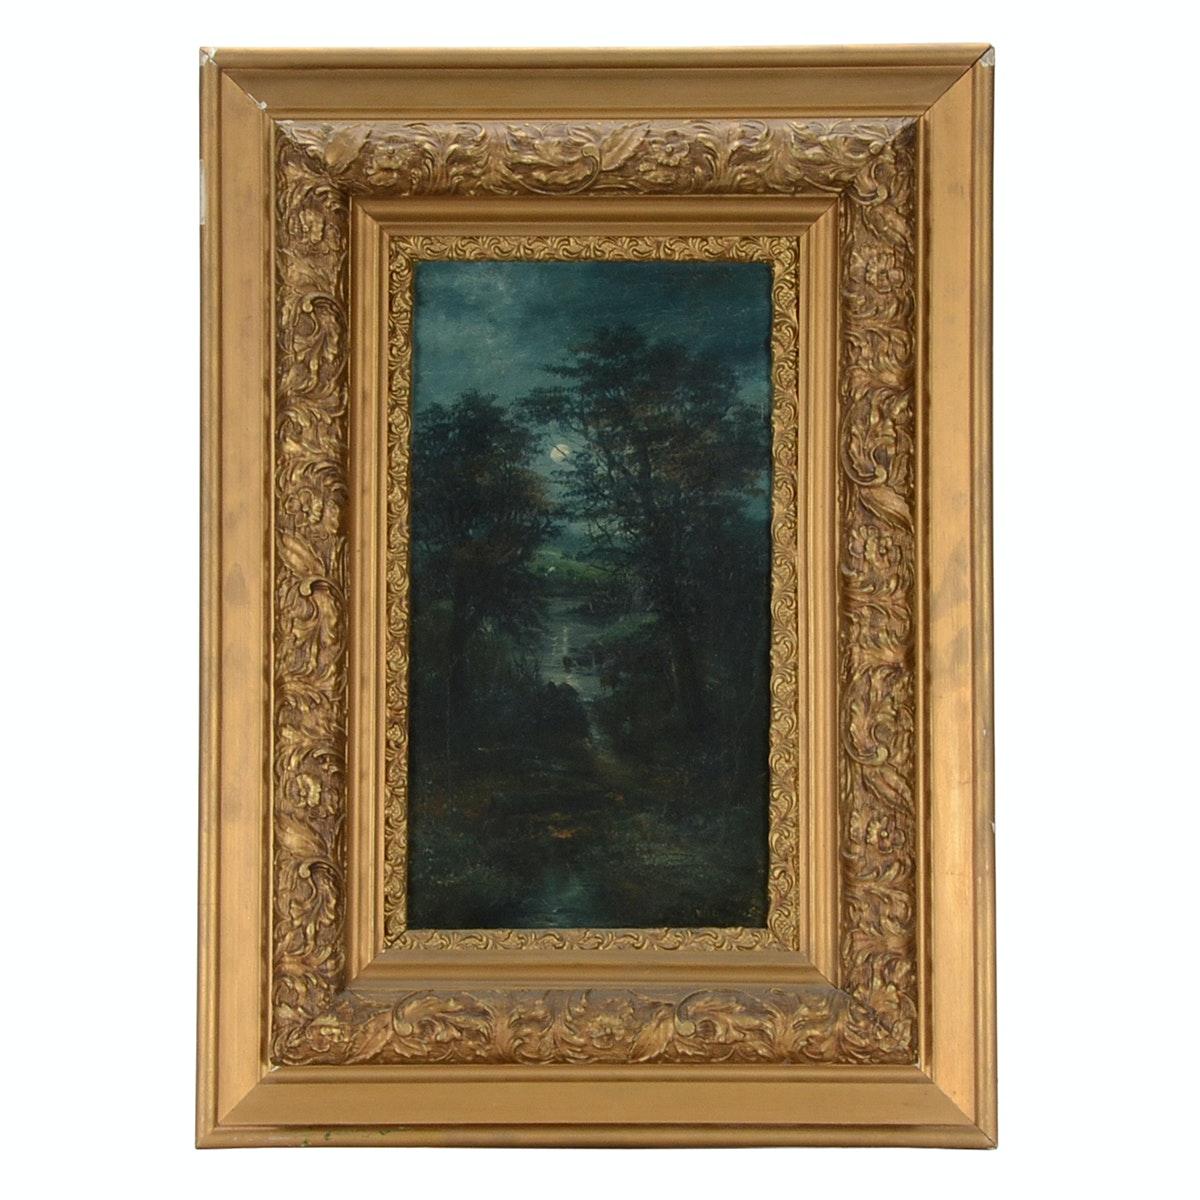 Antique G. Wallace Original Nocturne Oil Painting on Canvas